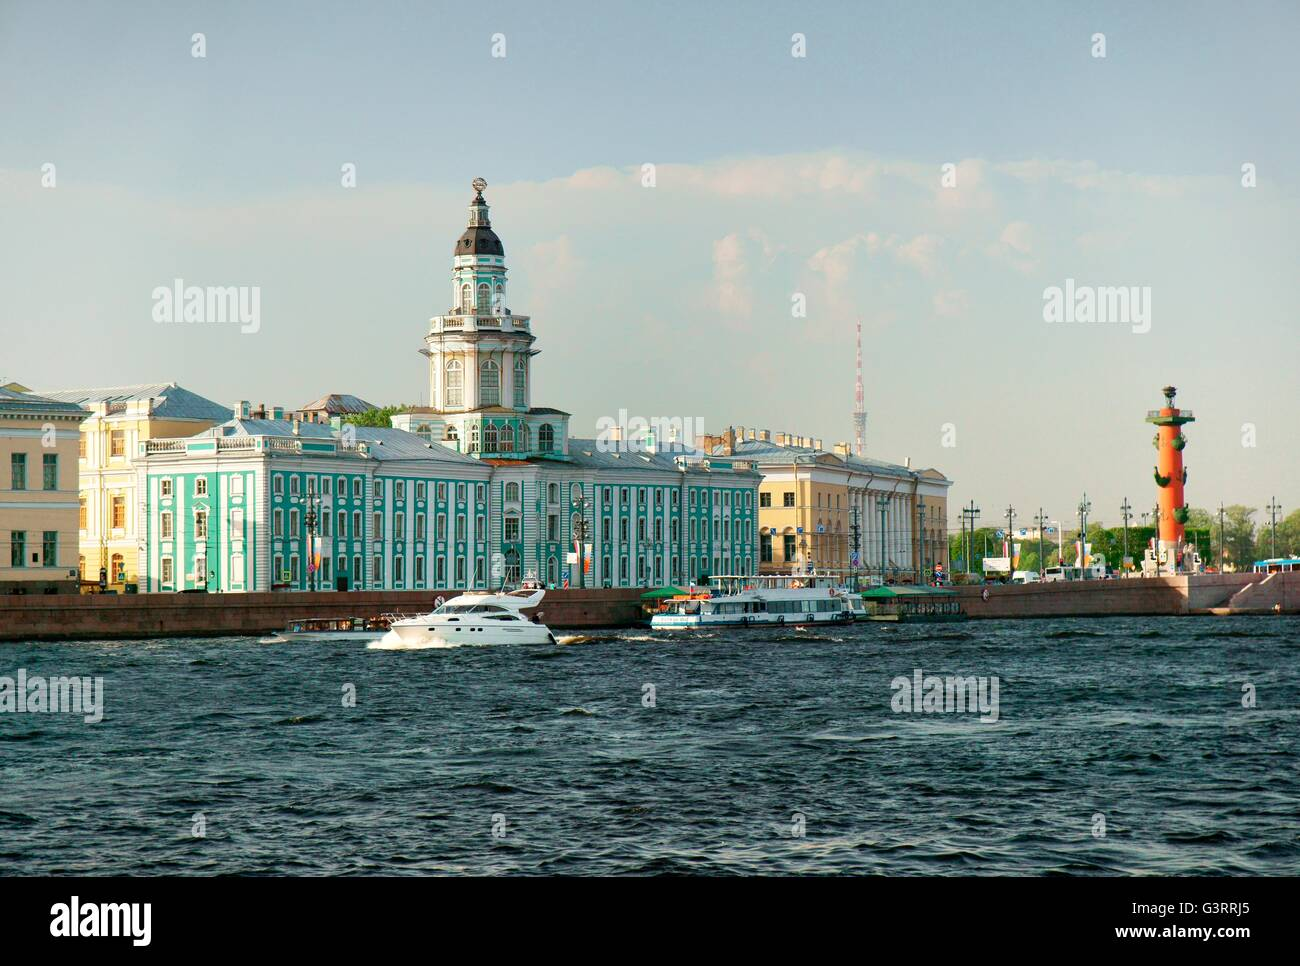 Saint Petersburg Russia. The blue Kunstkammer building, Zoologogical Museum and Rostral Column. Vasilevskiy Island - Stock Image